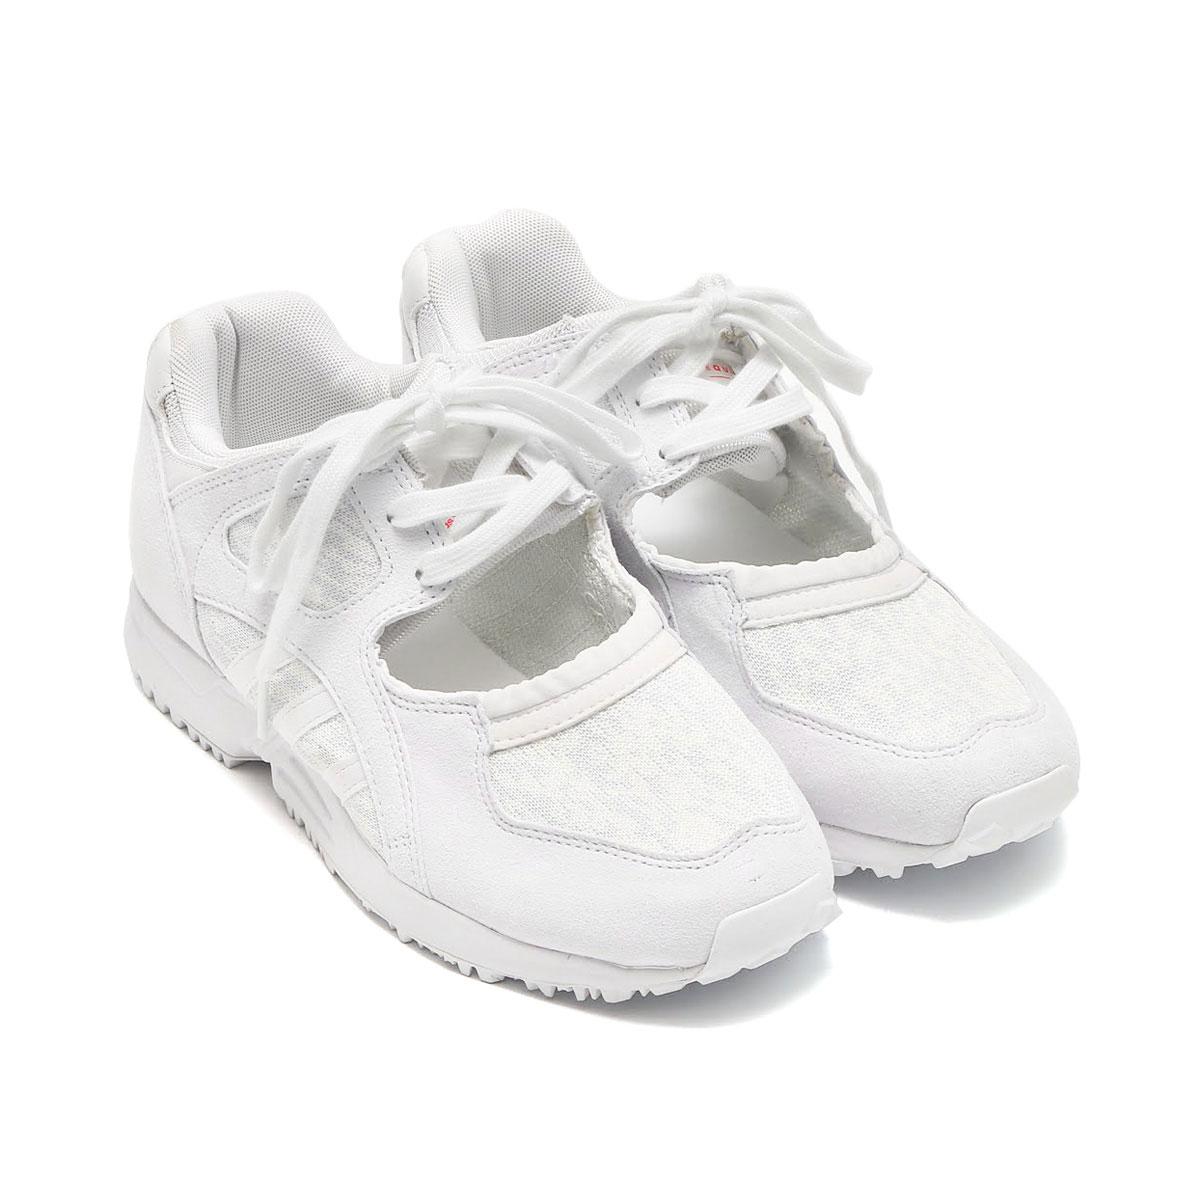 adidas Originals EQT RACING 91 W (CRYSTAL WHITE/RUNNING WHITE/TURBO) (アディダス オリジナルス エキップメント レーシング) 【レディース スニーカー】17SS-I